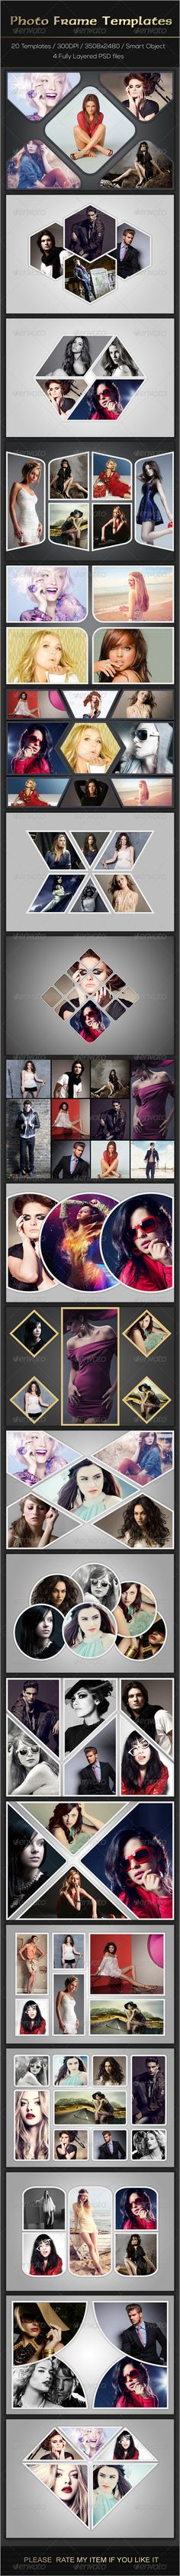 Photo Frame Templates PSD #design Download: http://graphicriver.net/item/photo-frame-templates/7636870?ref=ksioks